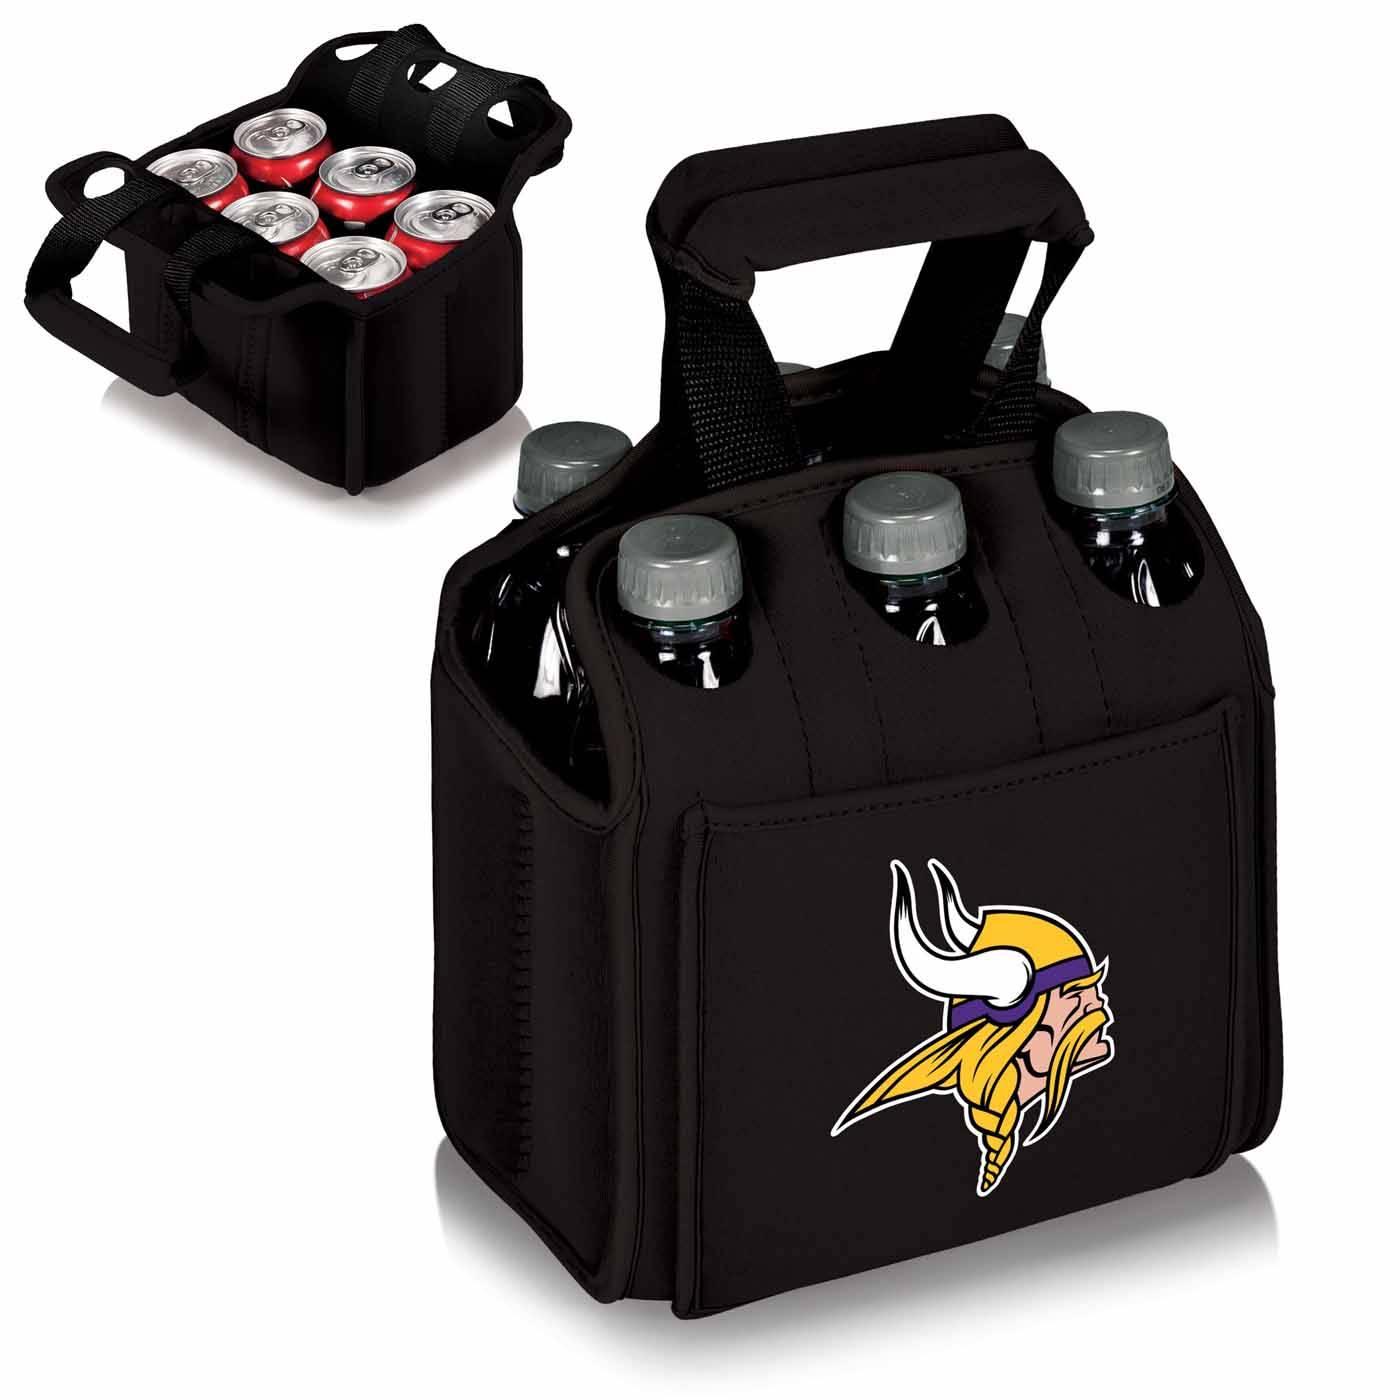 6 Pack Cooler ~ Minnesota vikings black six pack cooler tote